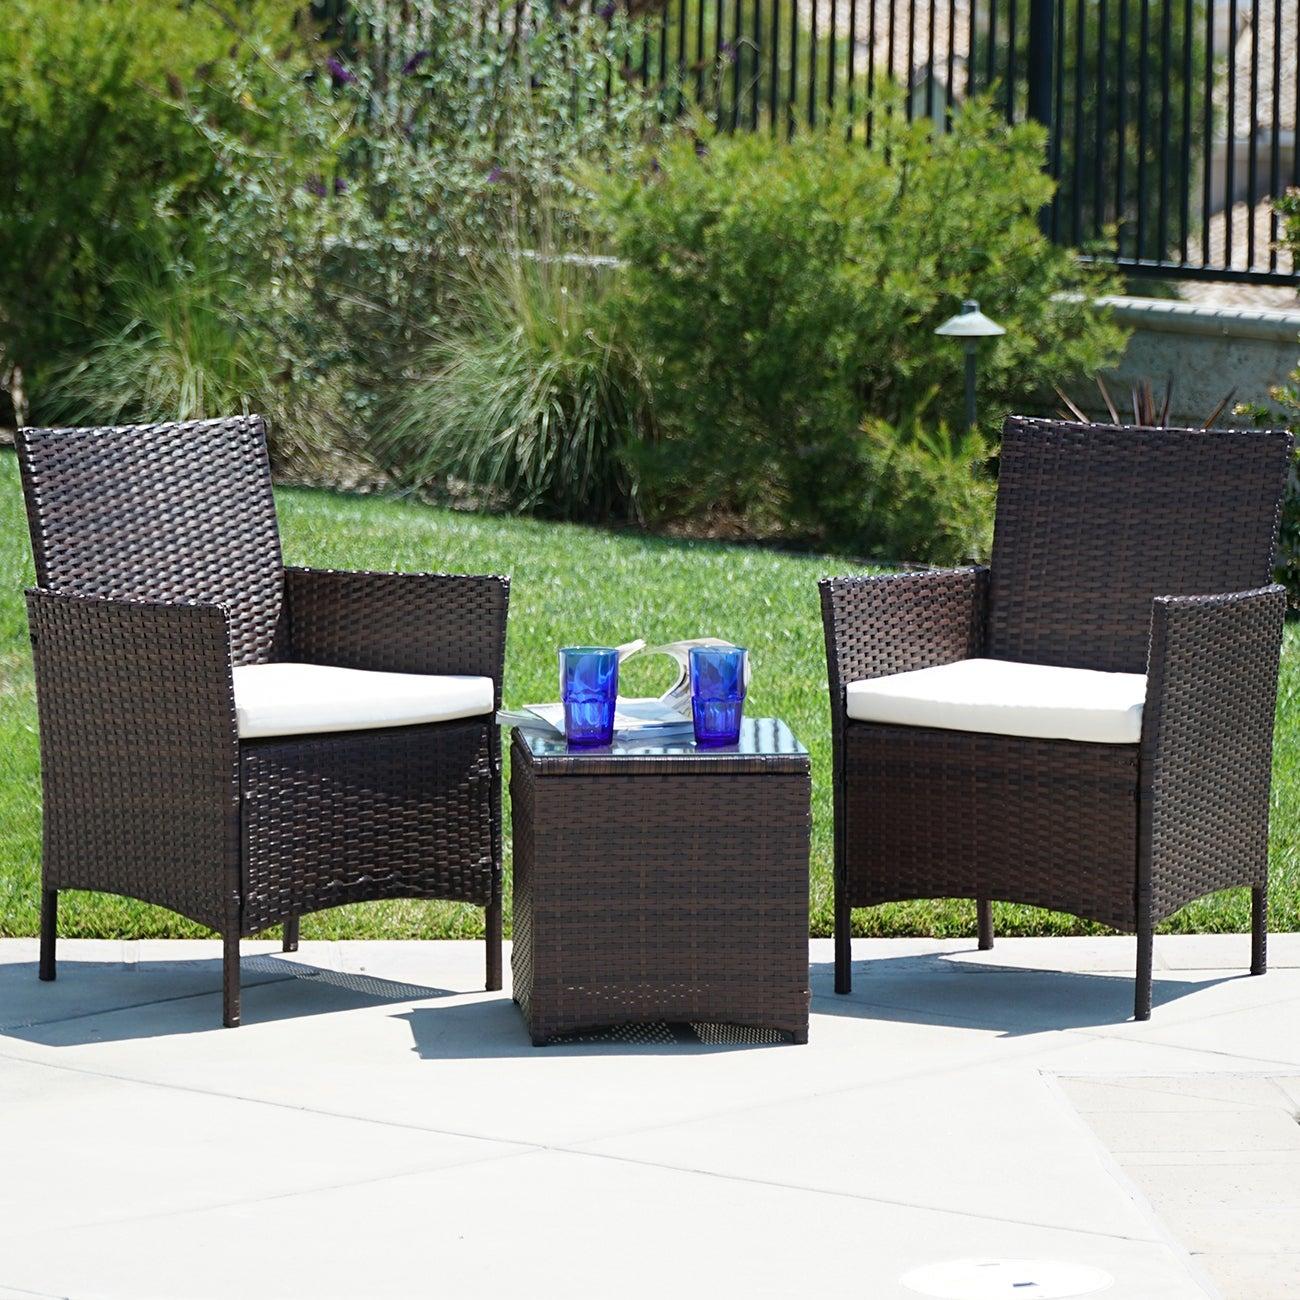 3 PCS Rattan Patio Furniture Set Garden Lawn Chair Cushioned Seat //w Table